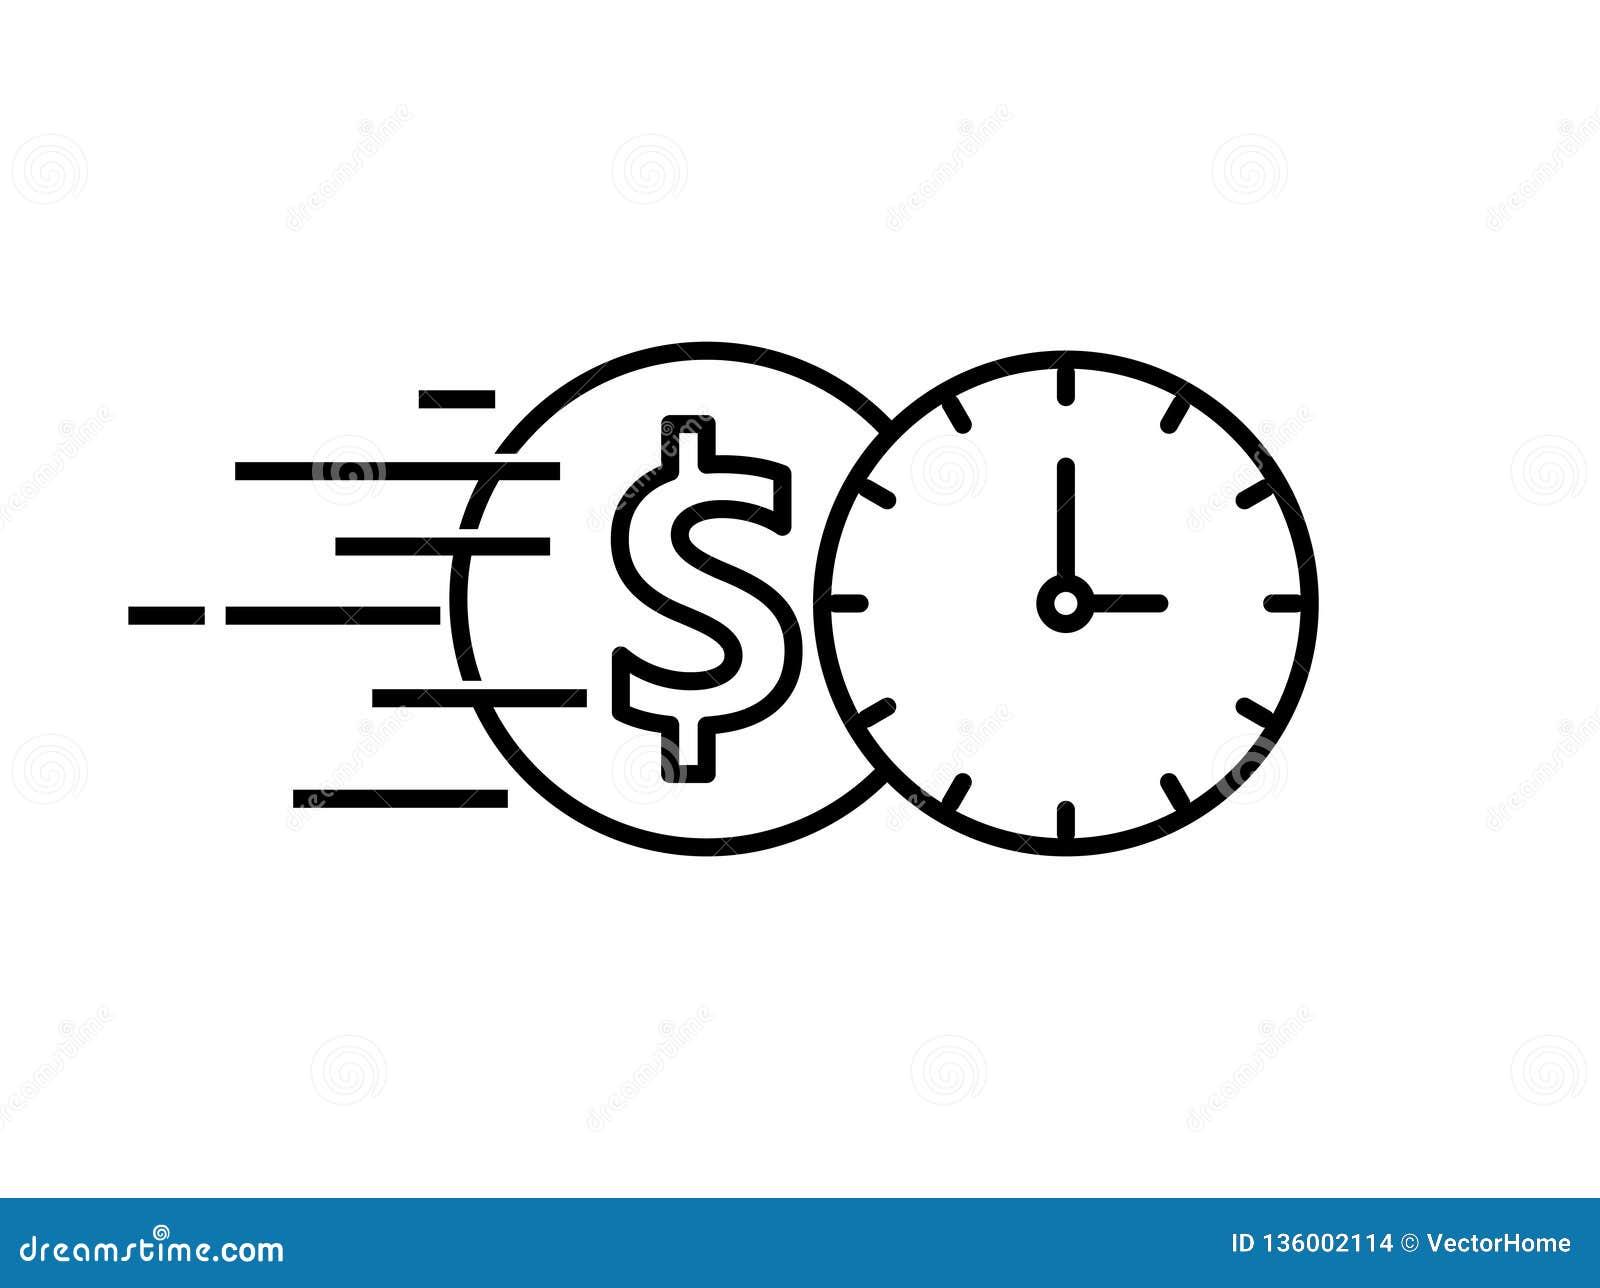 Quick Loan Icon, Vector Illustration Stock Vector ...